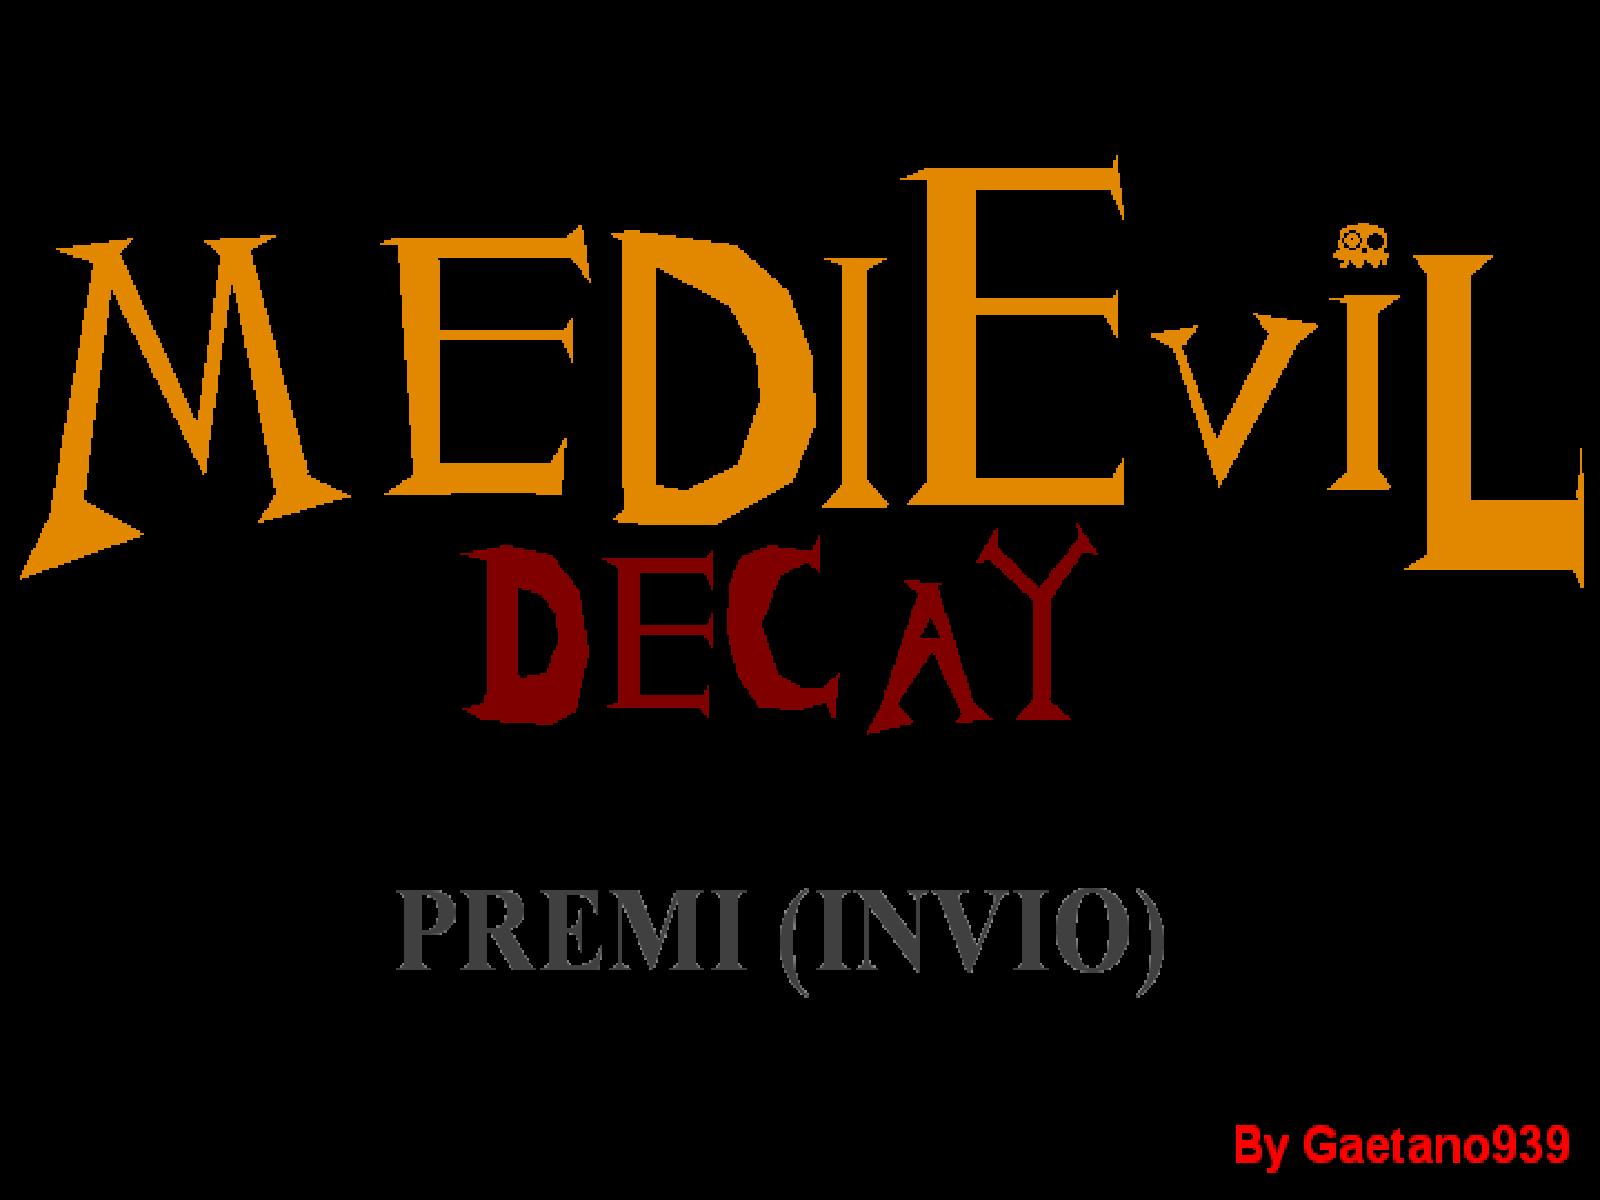 MediEvil Decay